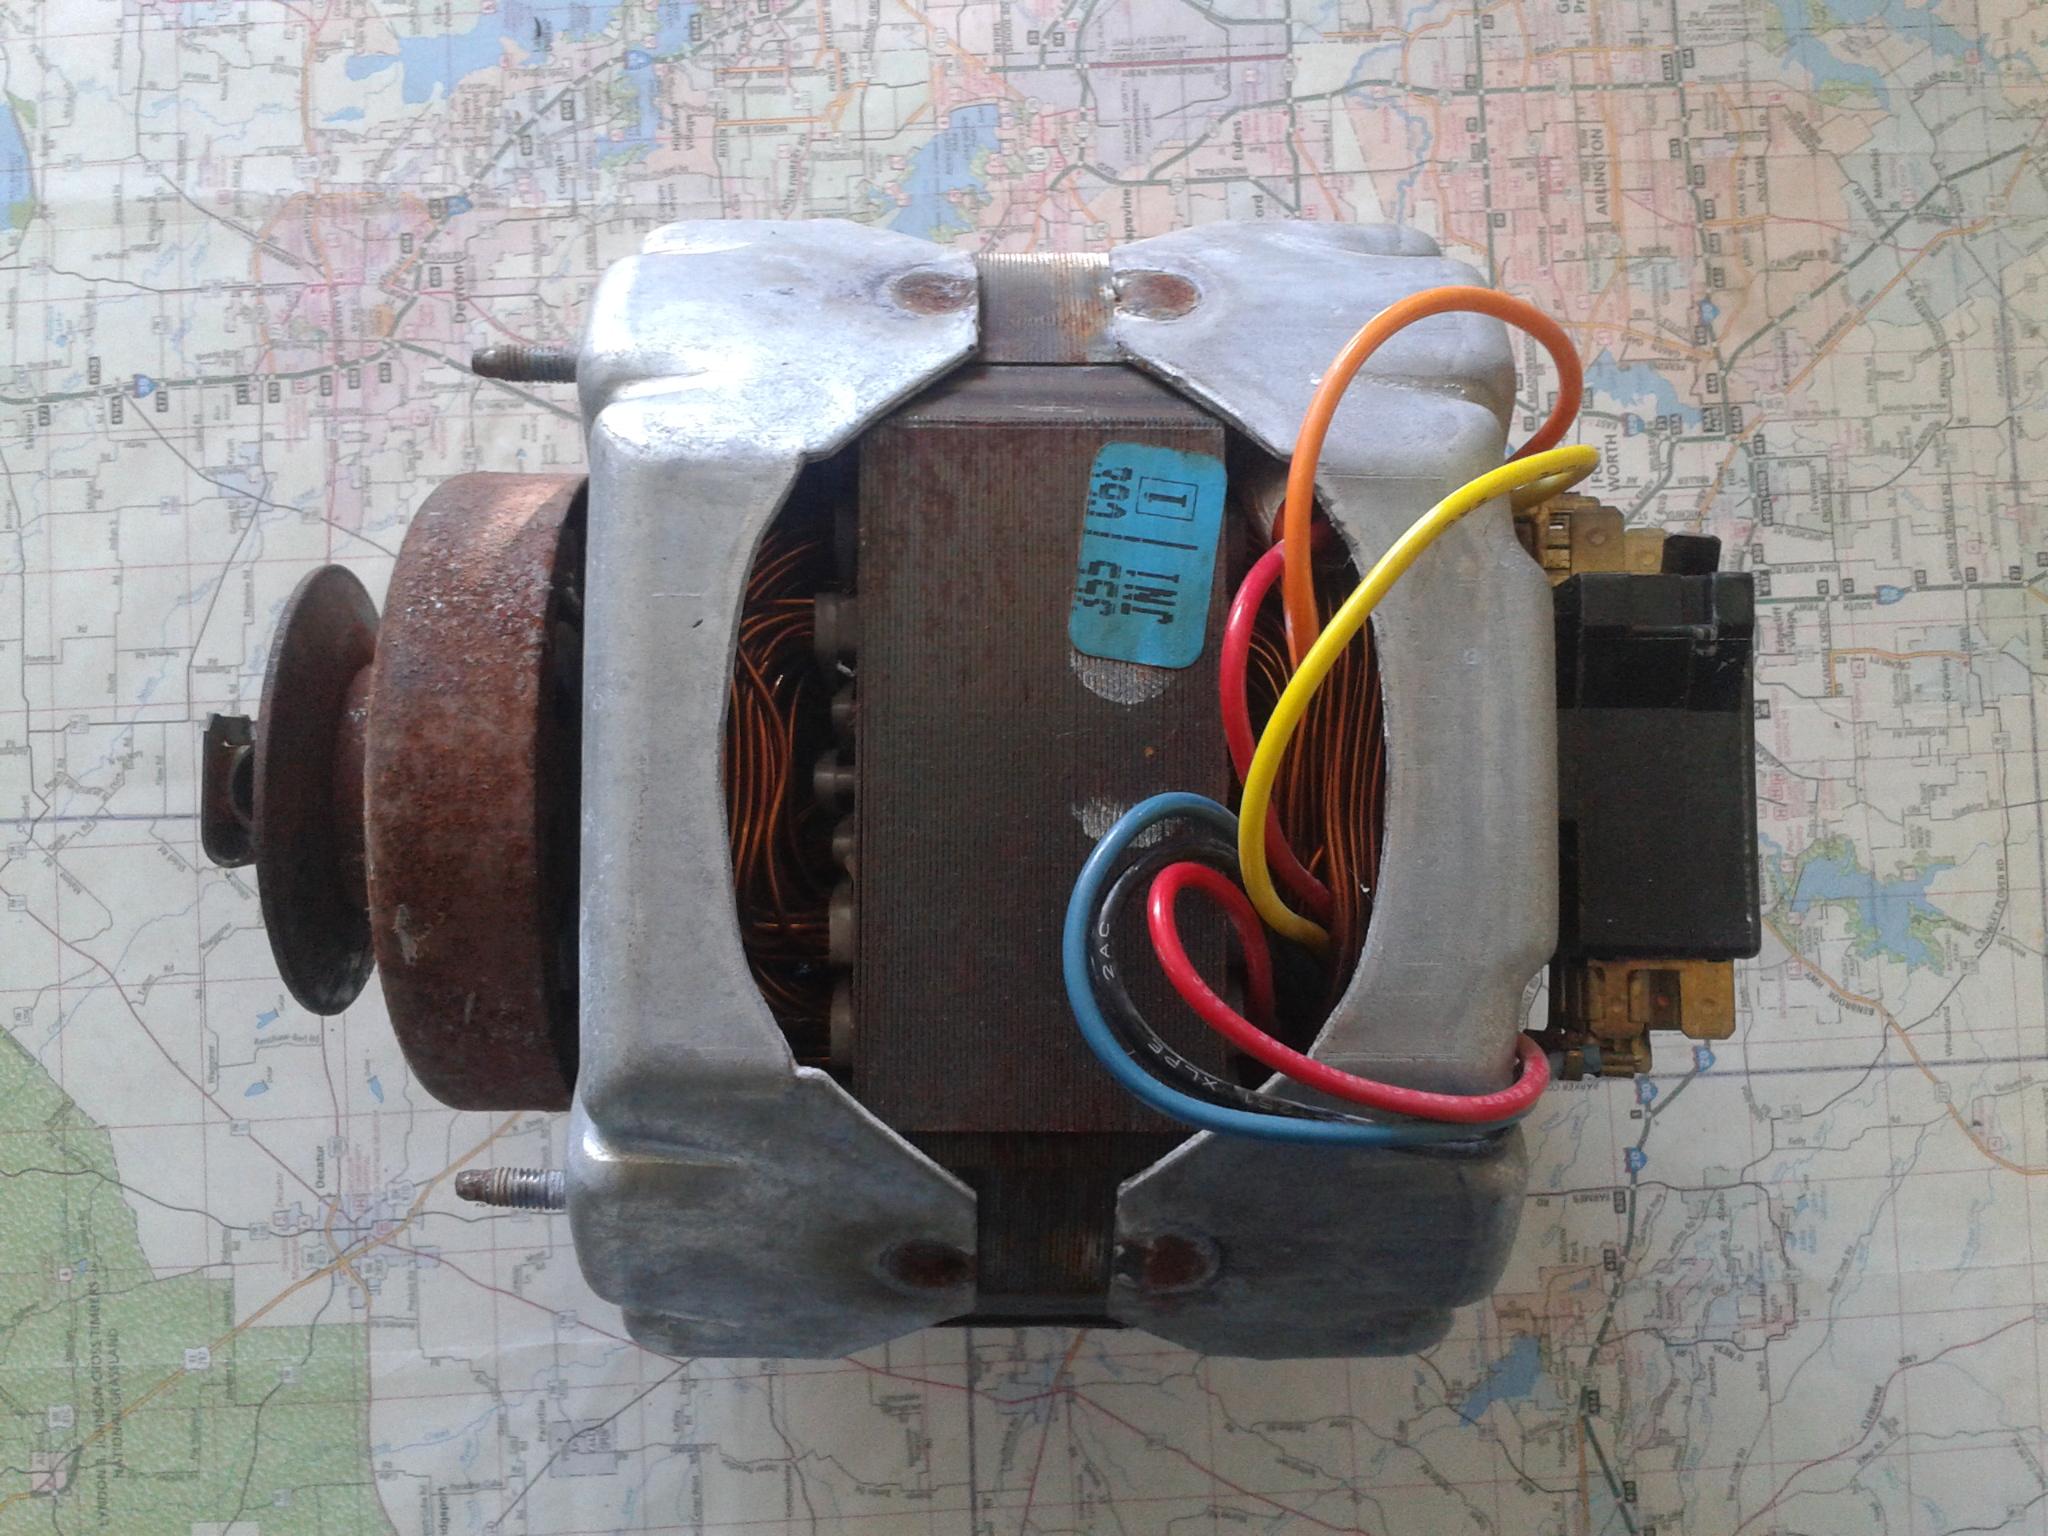 SM_9396] Ge Washer Motor Wiring Diagram Schematic WiringCrove Amenti Spoat Inifo Trons Mohammedshrine Librar Wiring 101